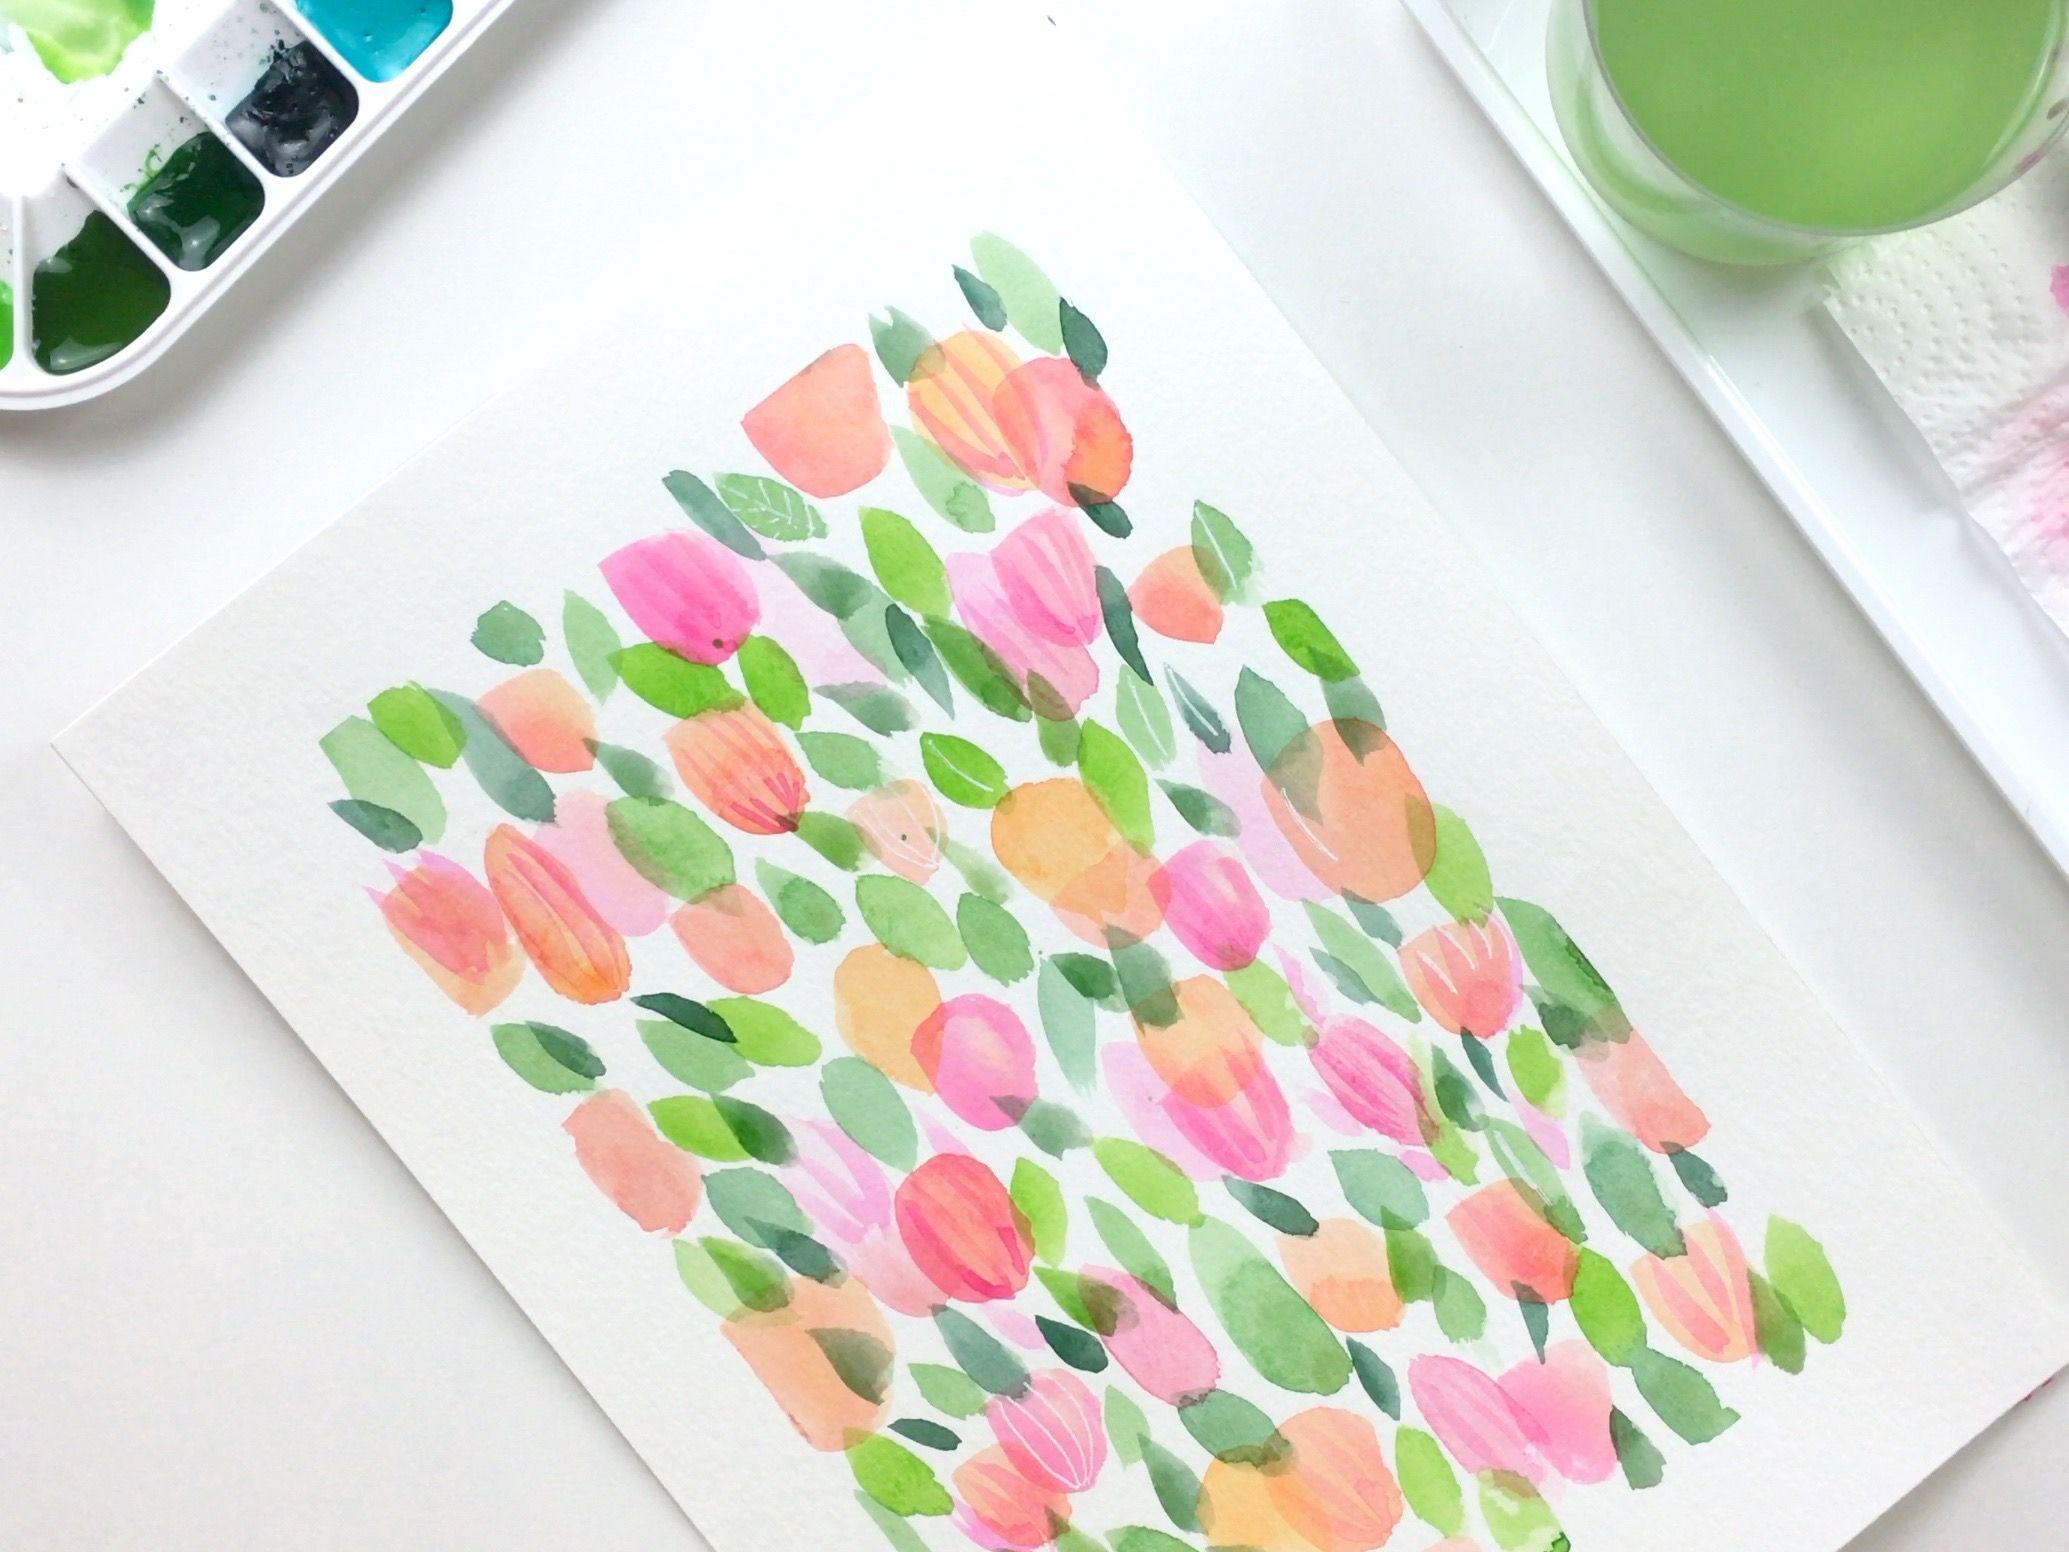 Lámina de flores para principiantes, fácil y paso a paso.